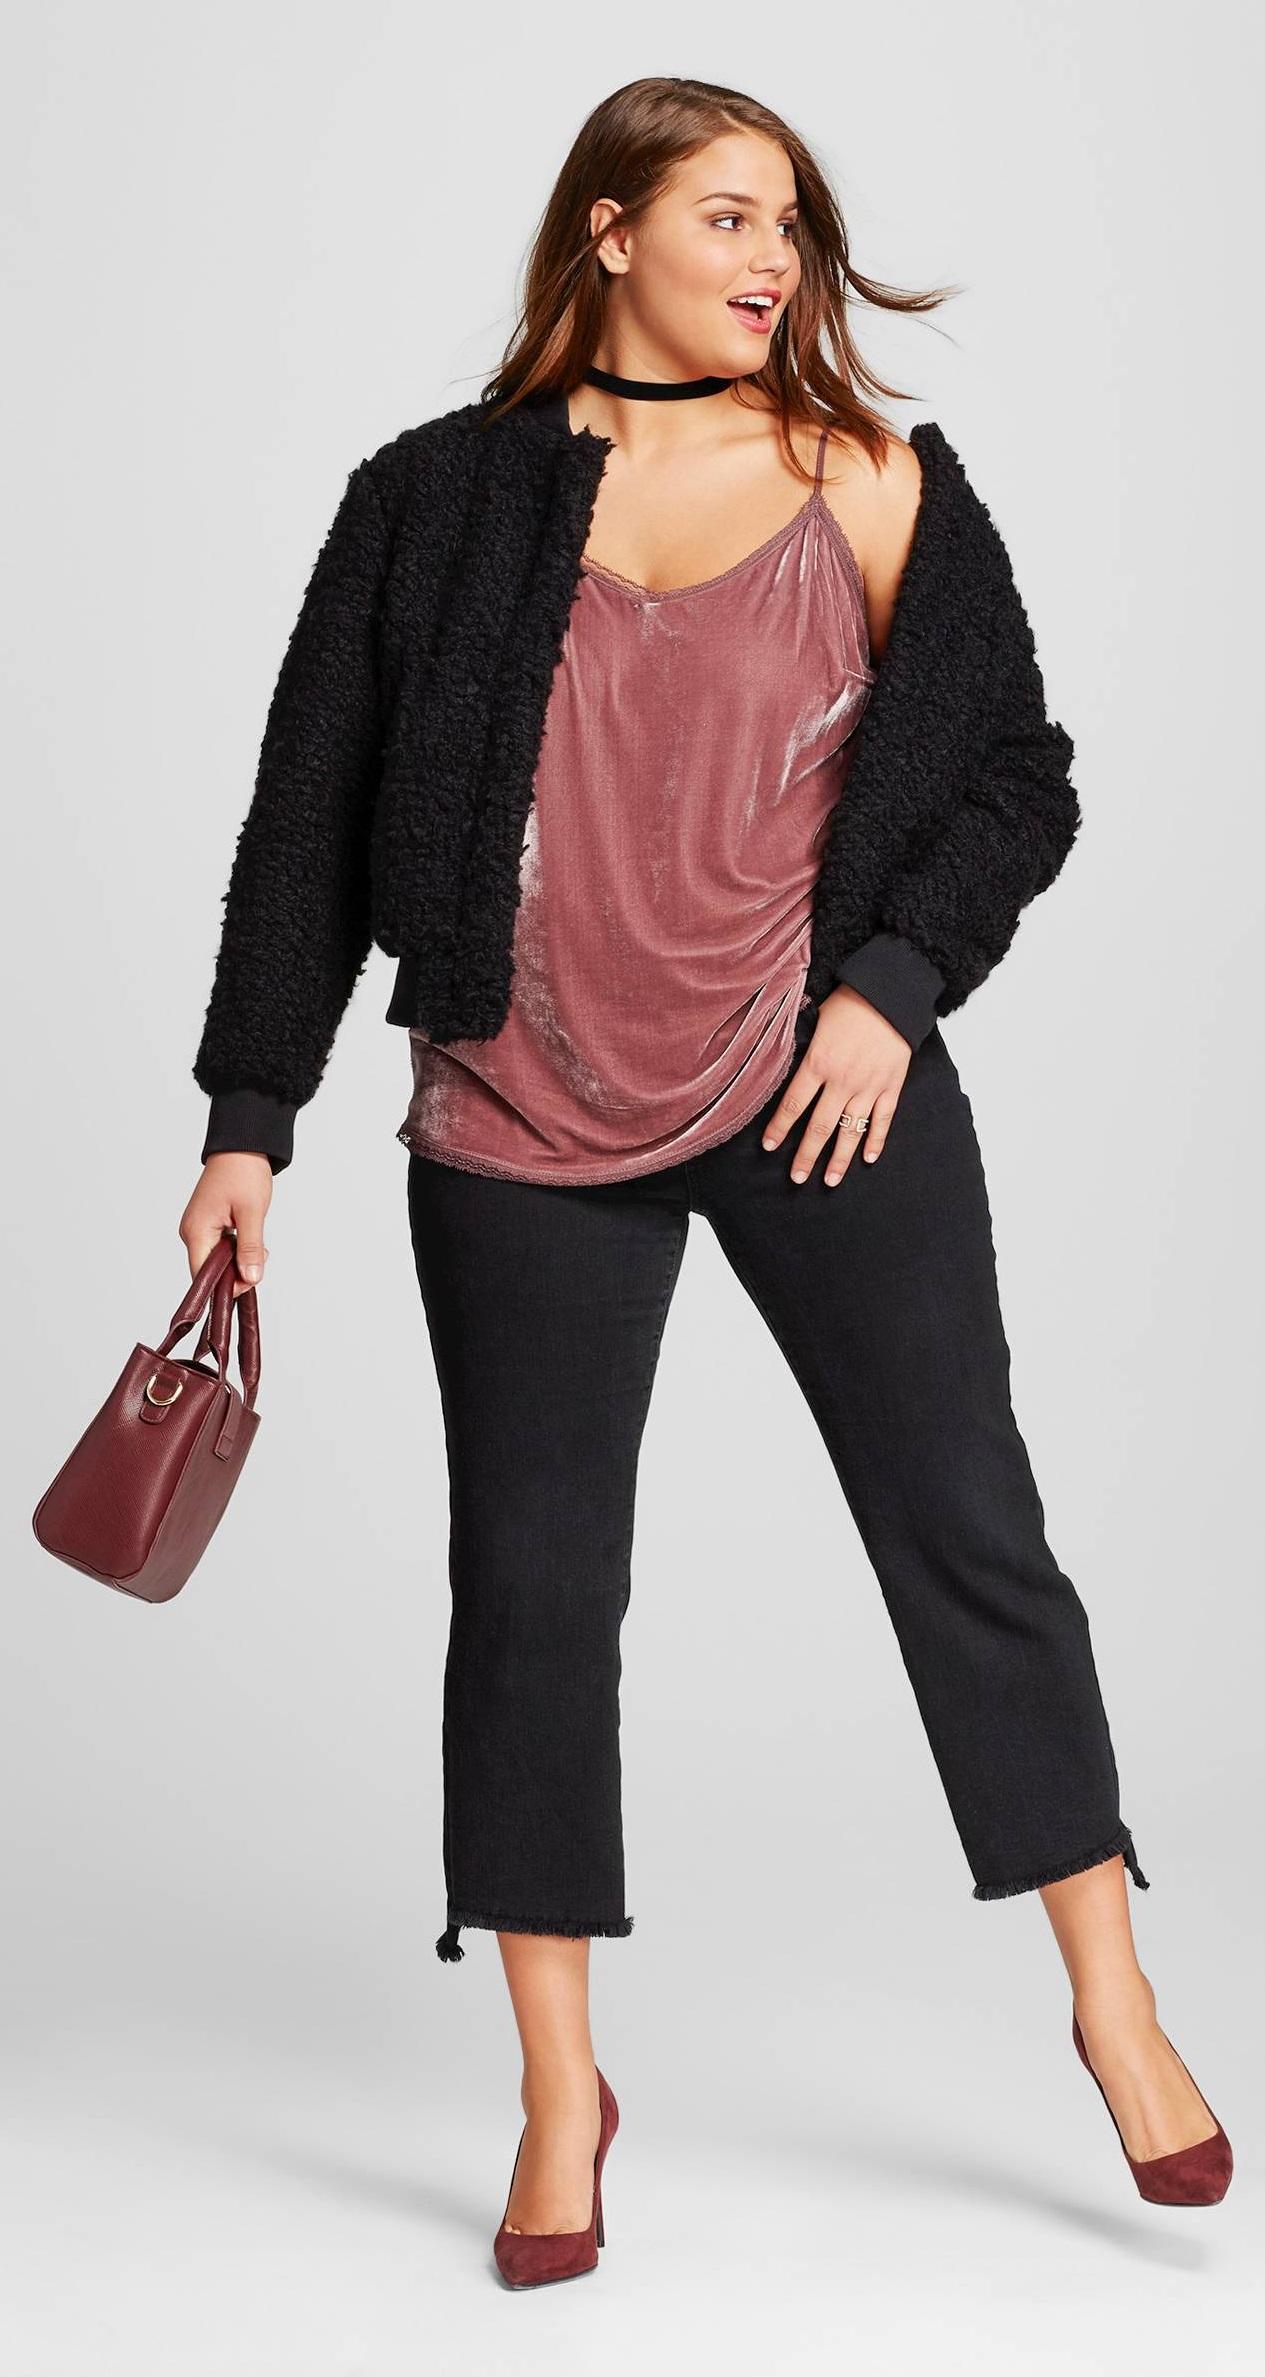 black-crop-jeans-choker-burgundy-bag-burgundy-shoe-pumps-black-jacket-bomber-fur-fuzz-pink-light-cami-fall-winter-hairr-lunch.jpg